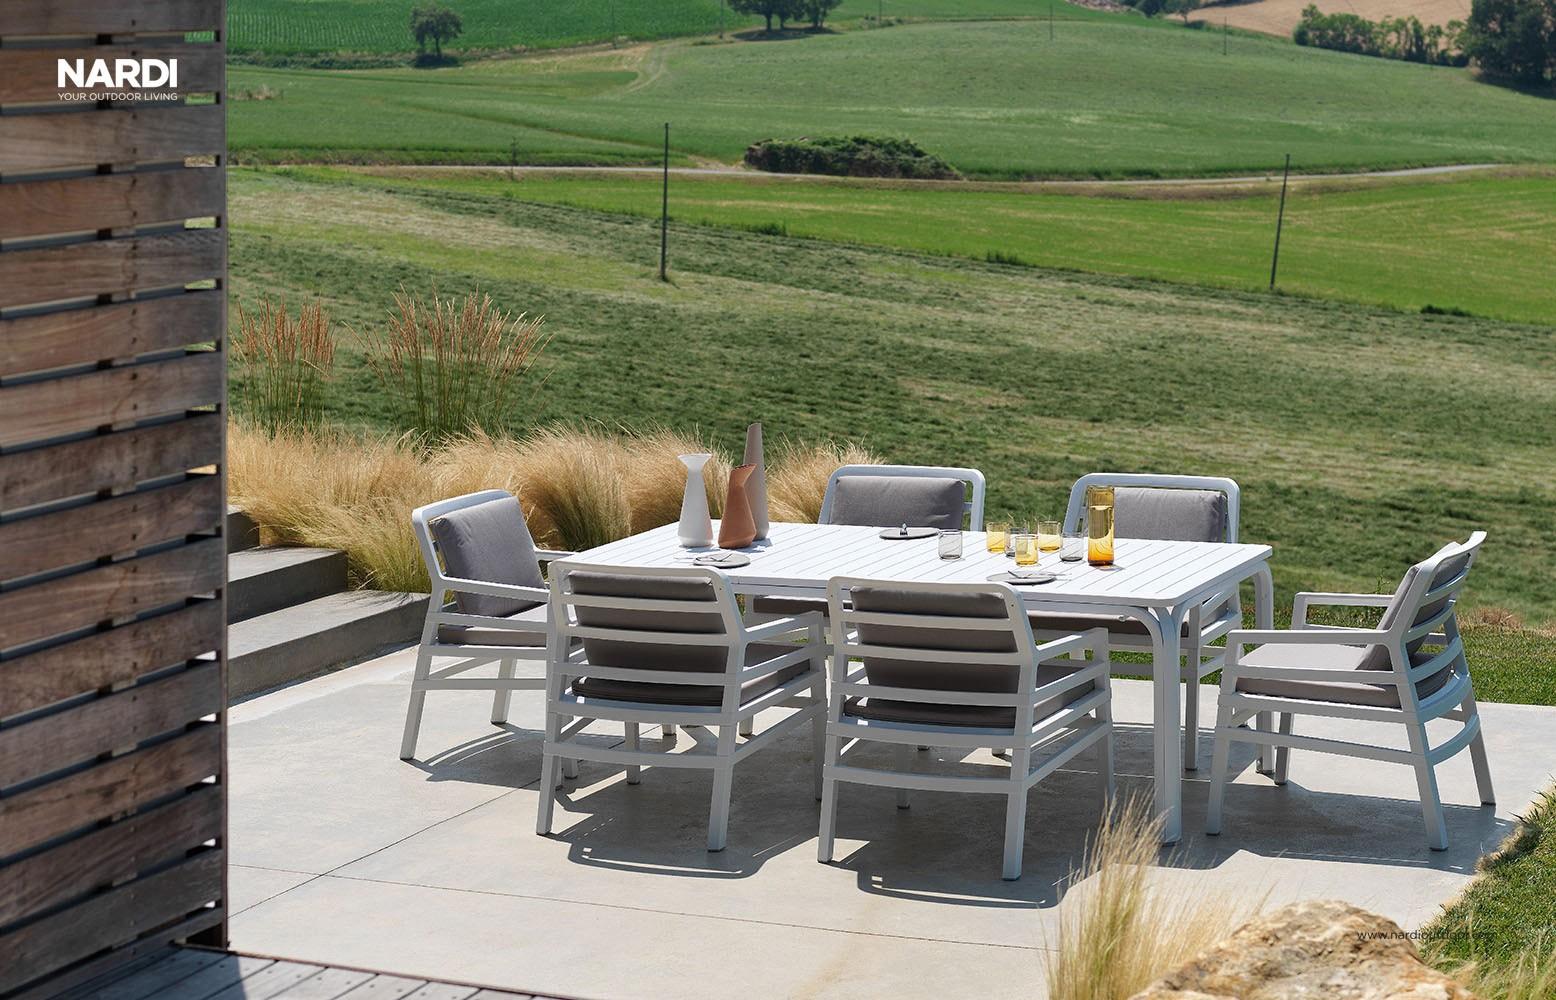 Poltrona da giardino ed esterno con cuscini aria nardi